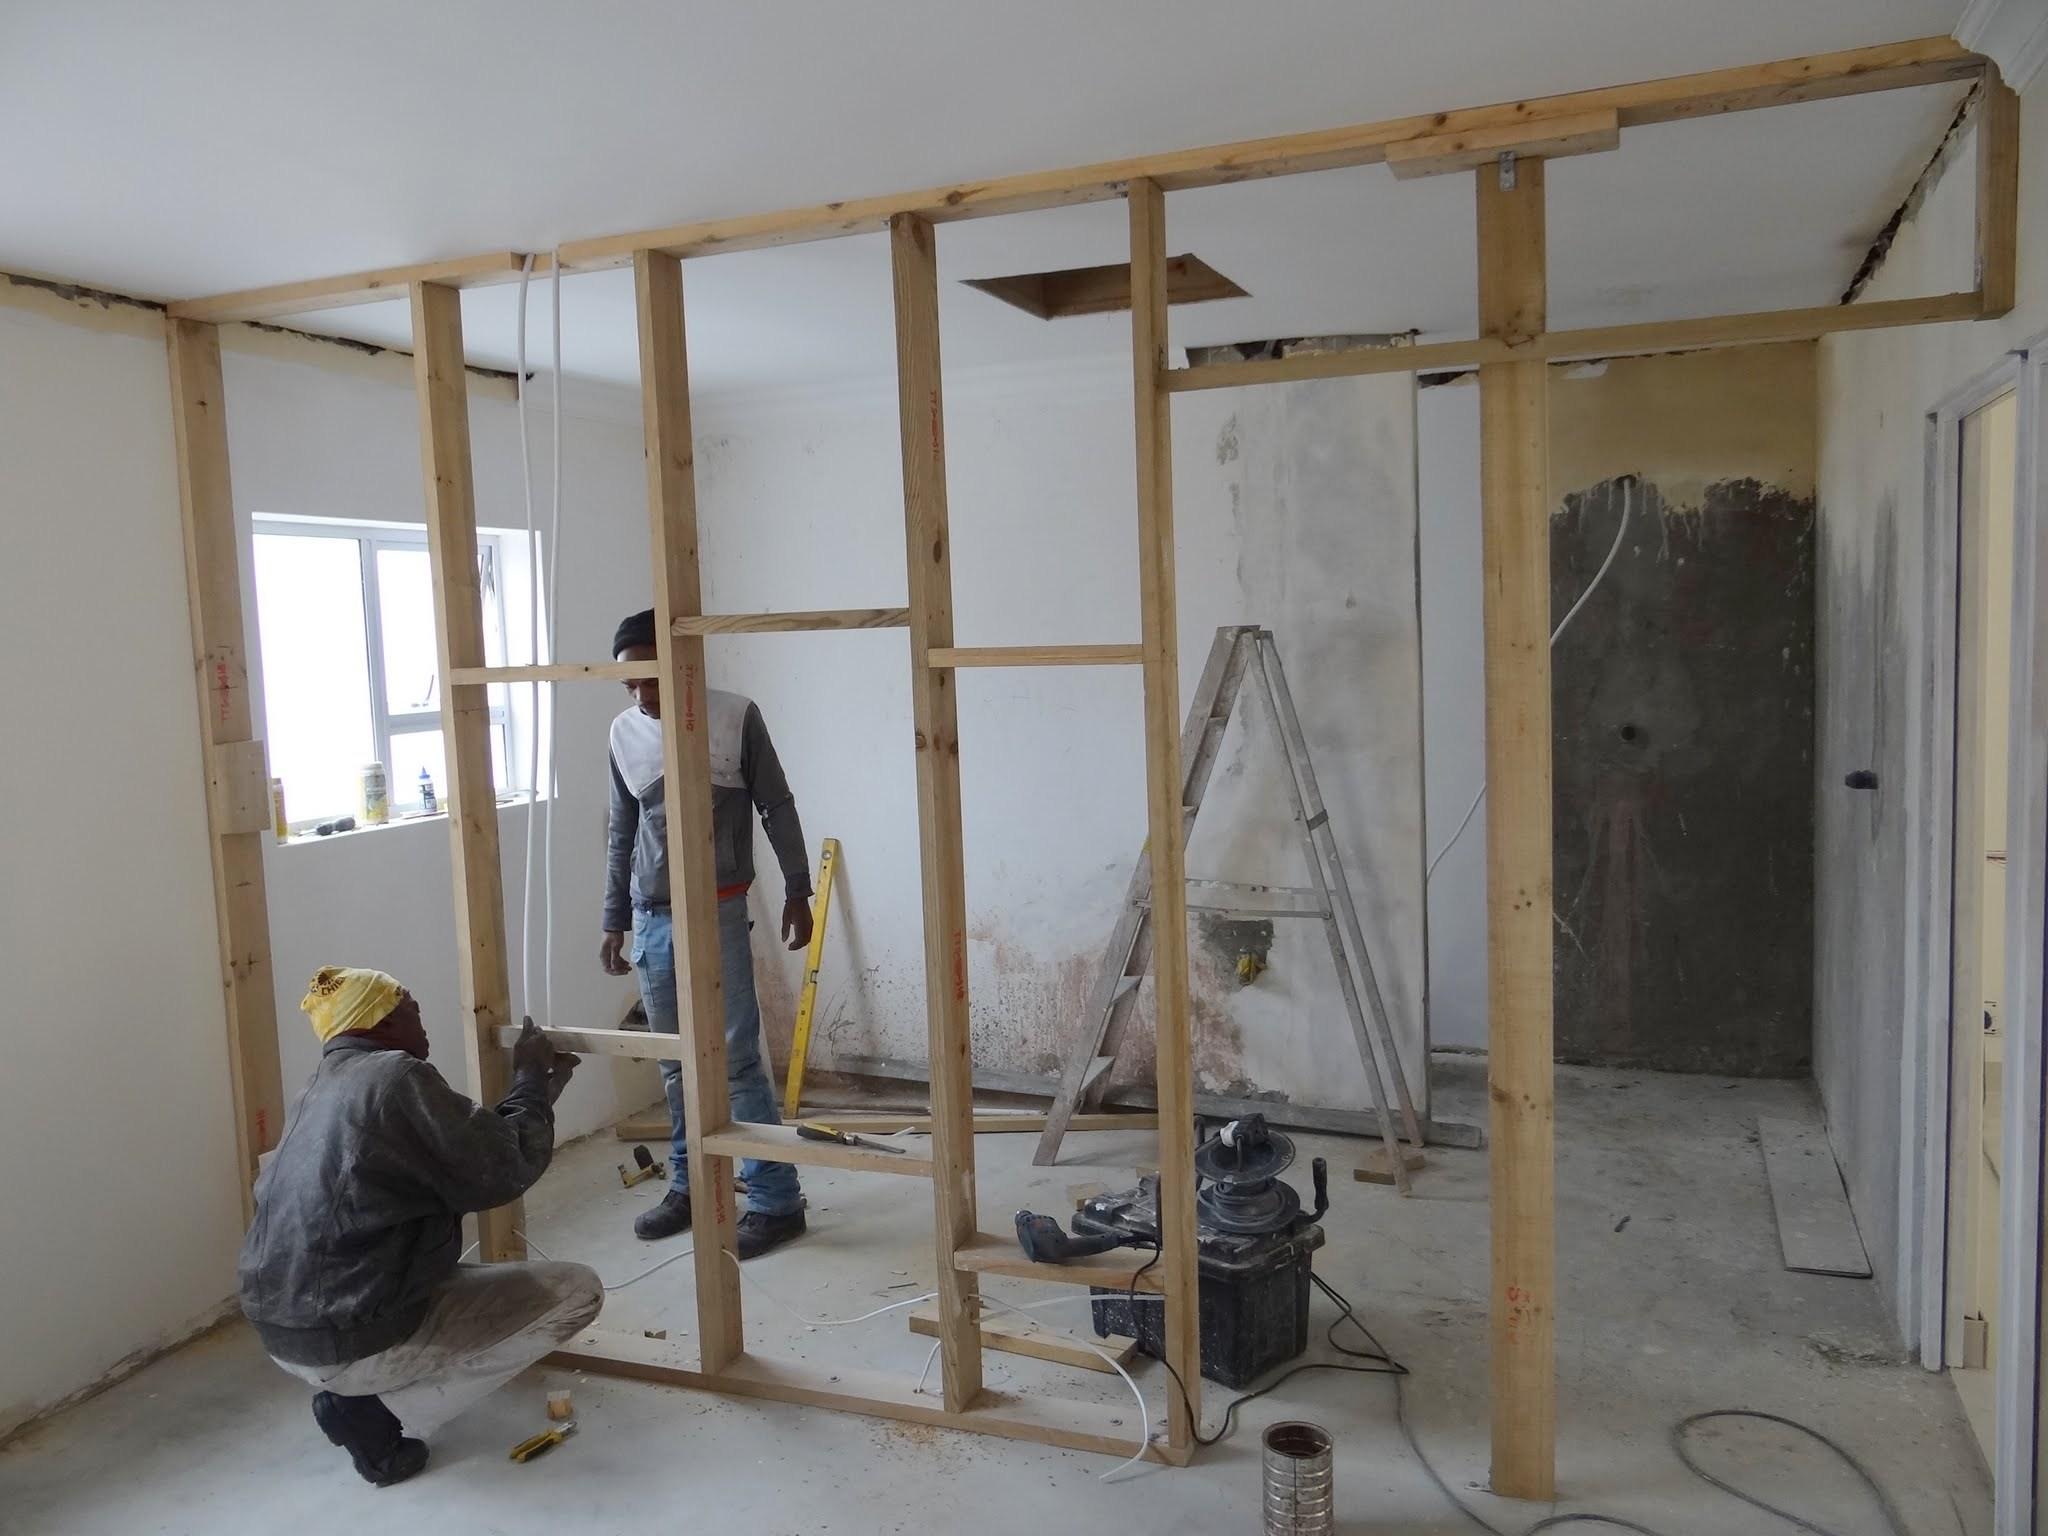 Build drywall